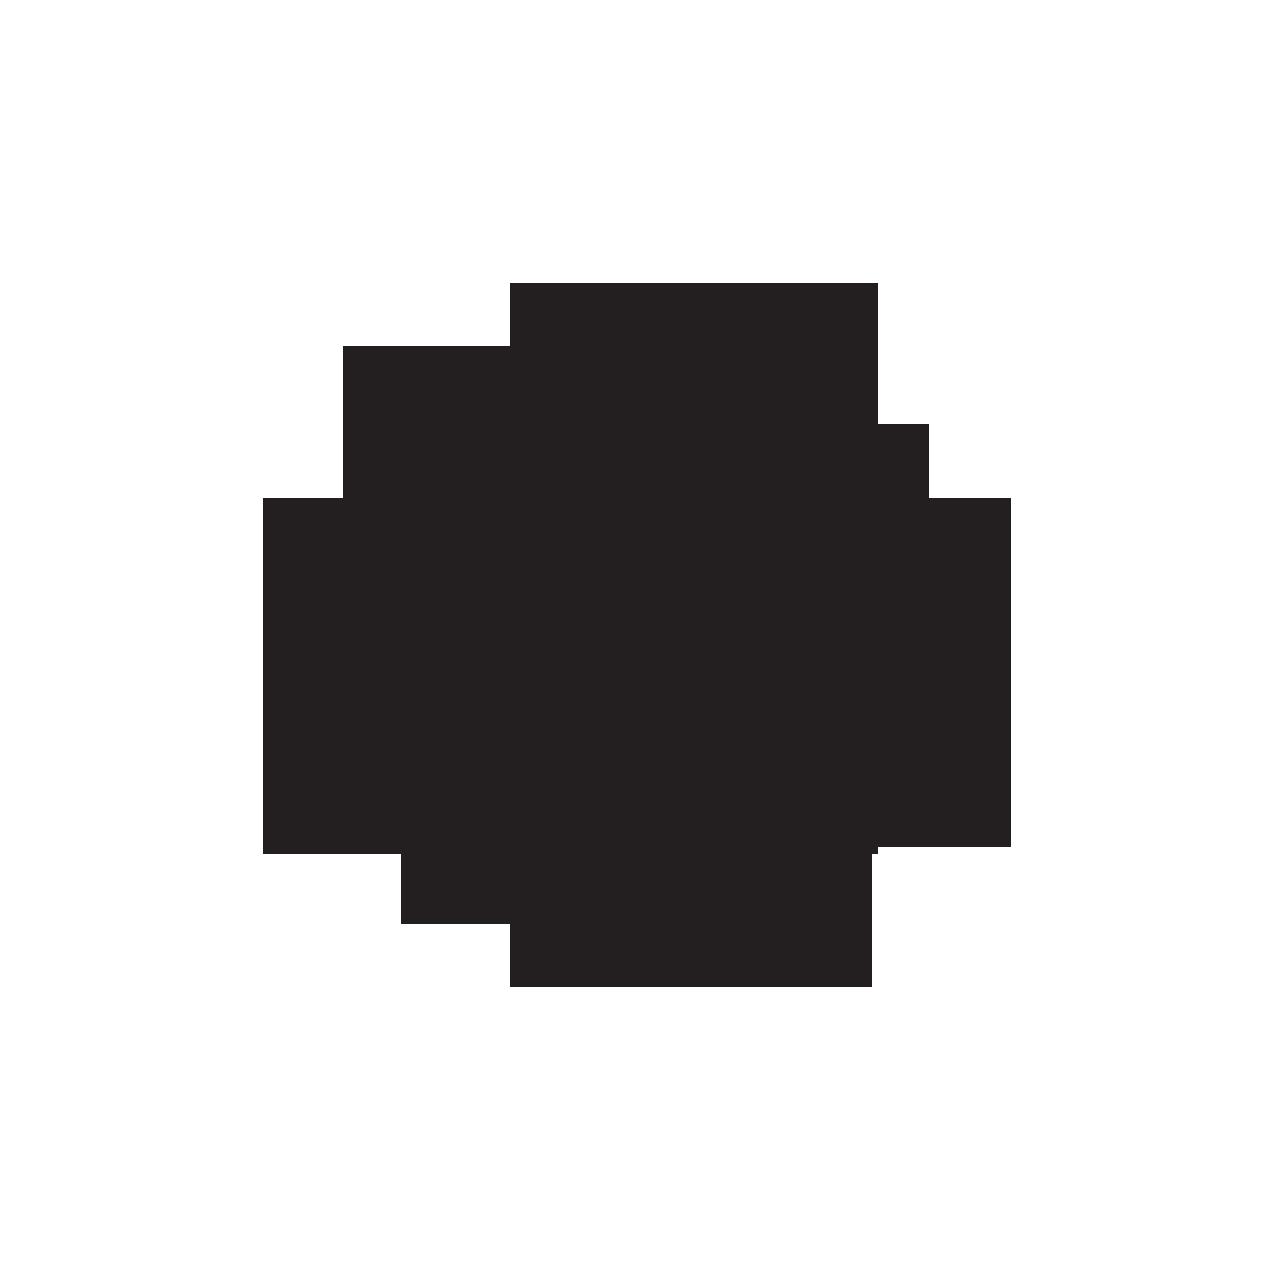 Amoln